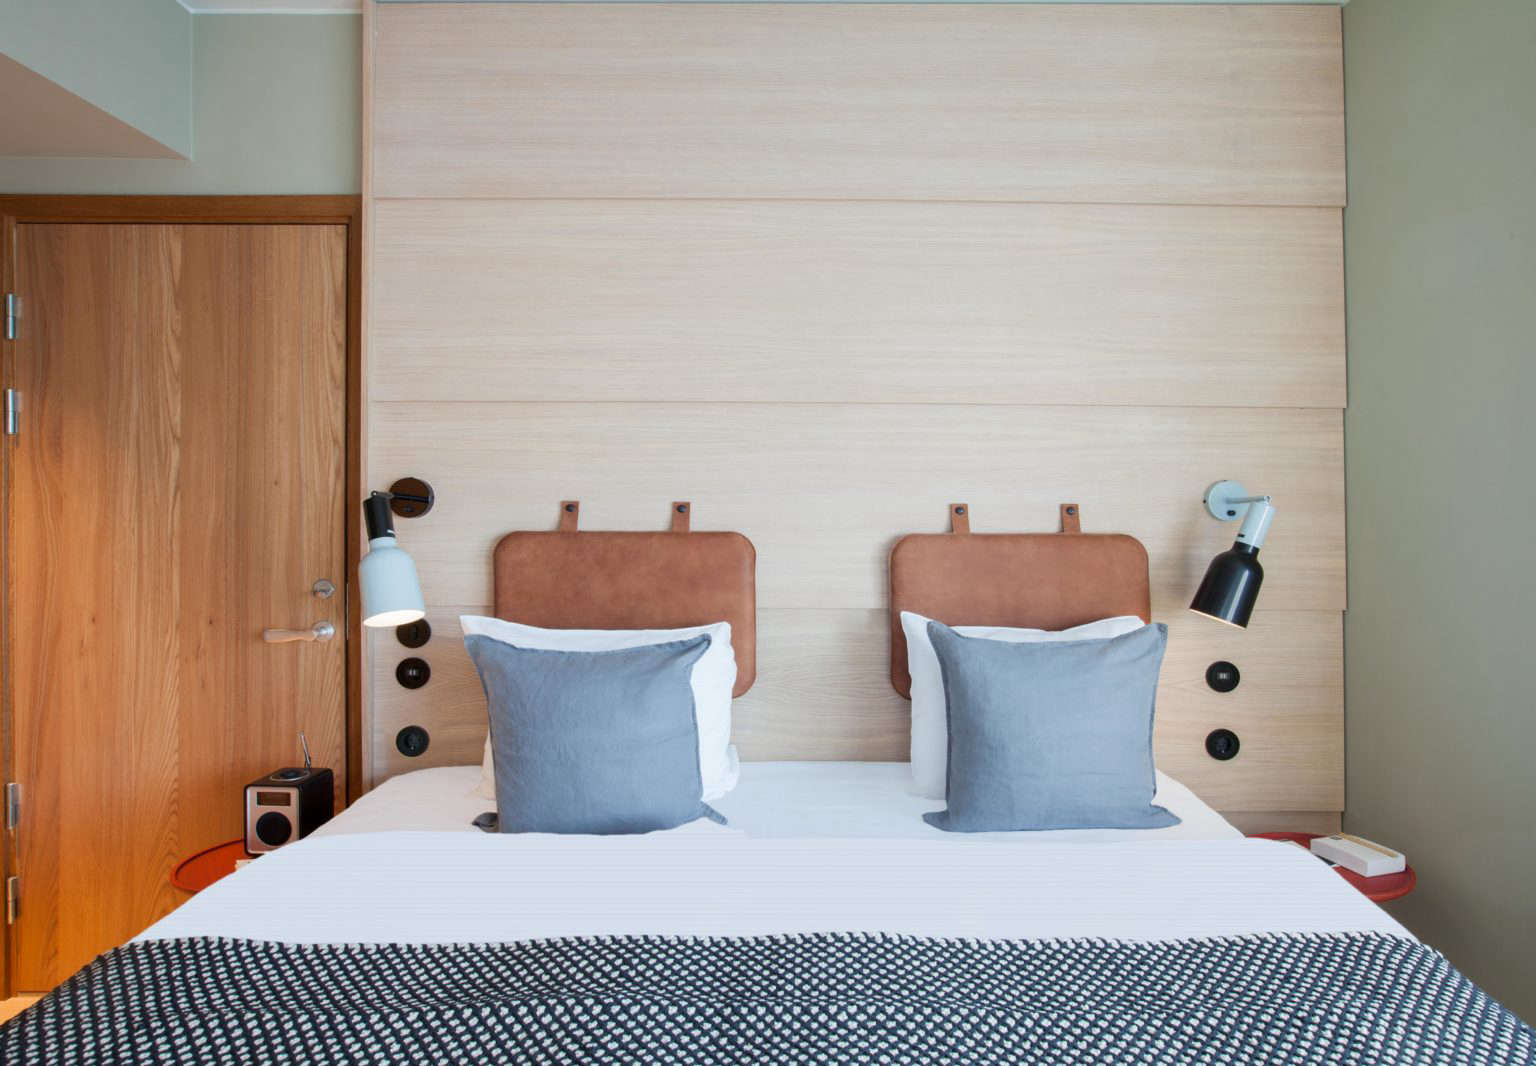 Leather headboard, Hobo Hotel Stockholm designed by Studio Aisslinger. Patricia Parinejad photo.